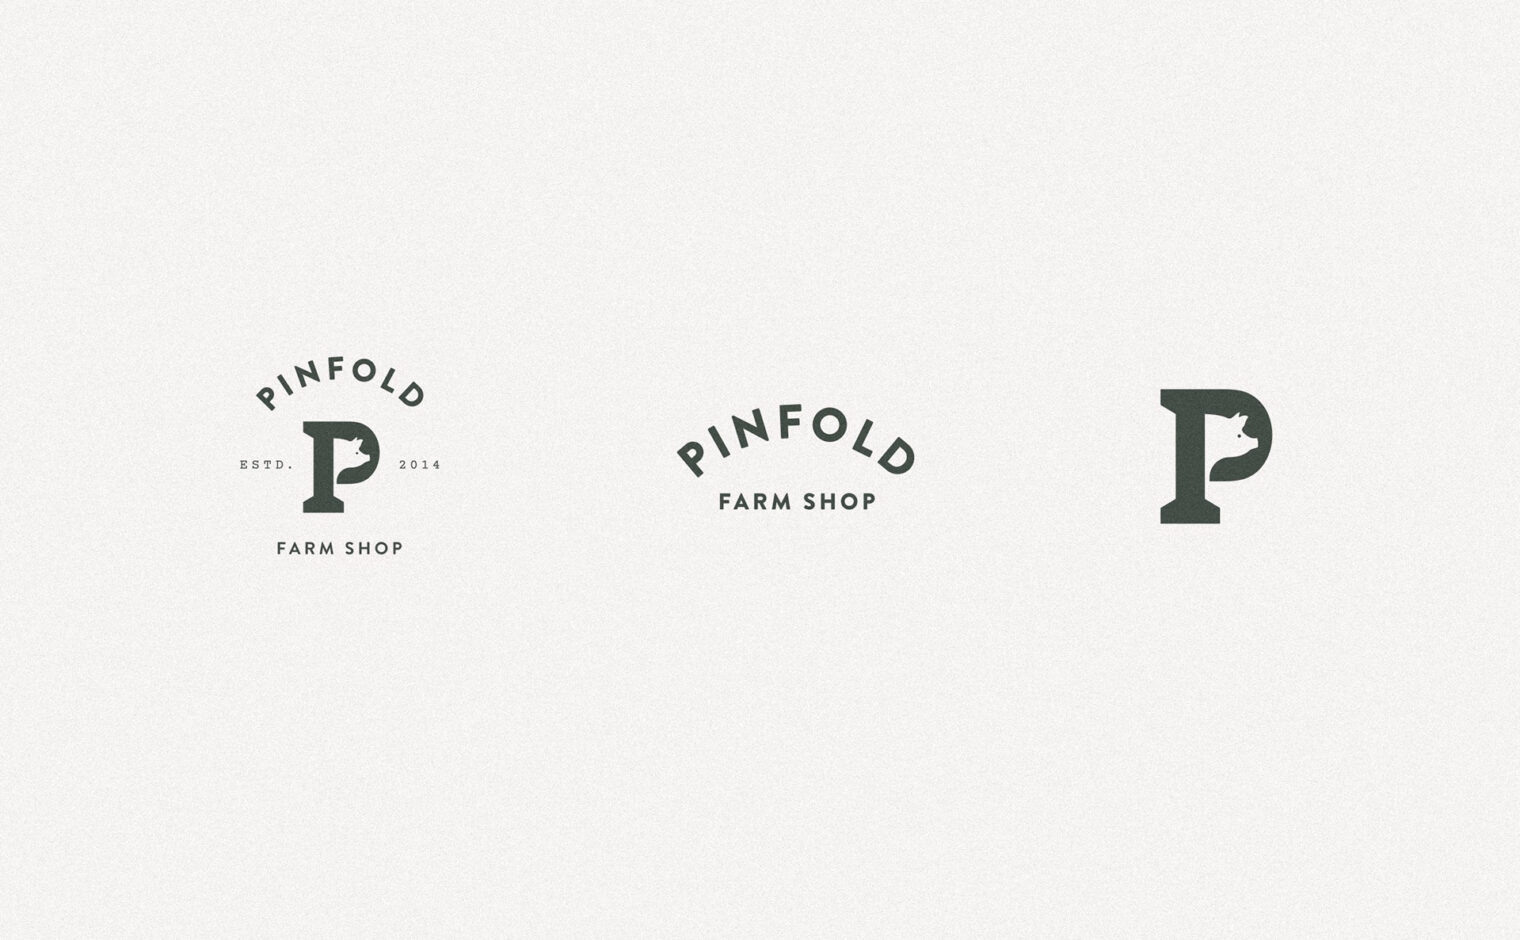 Pinfold Farm Shop logo variations